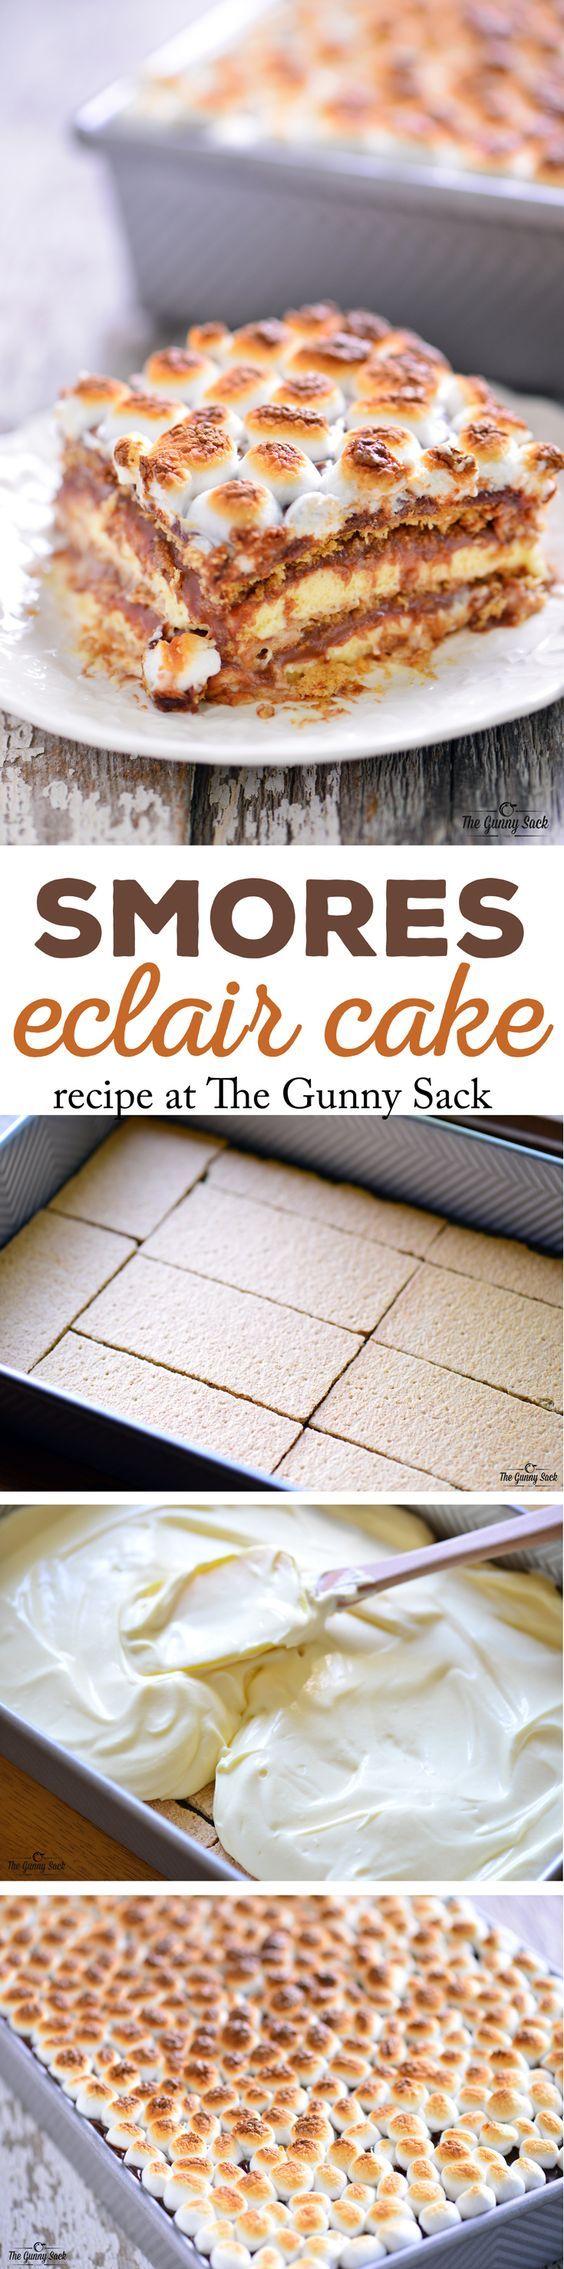 Best 10+ Eclair cake recipes ideas on Pinterest | Chocolate eclair ...